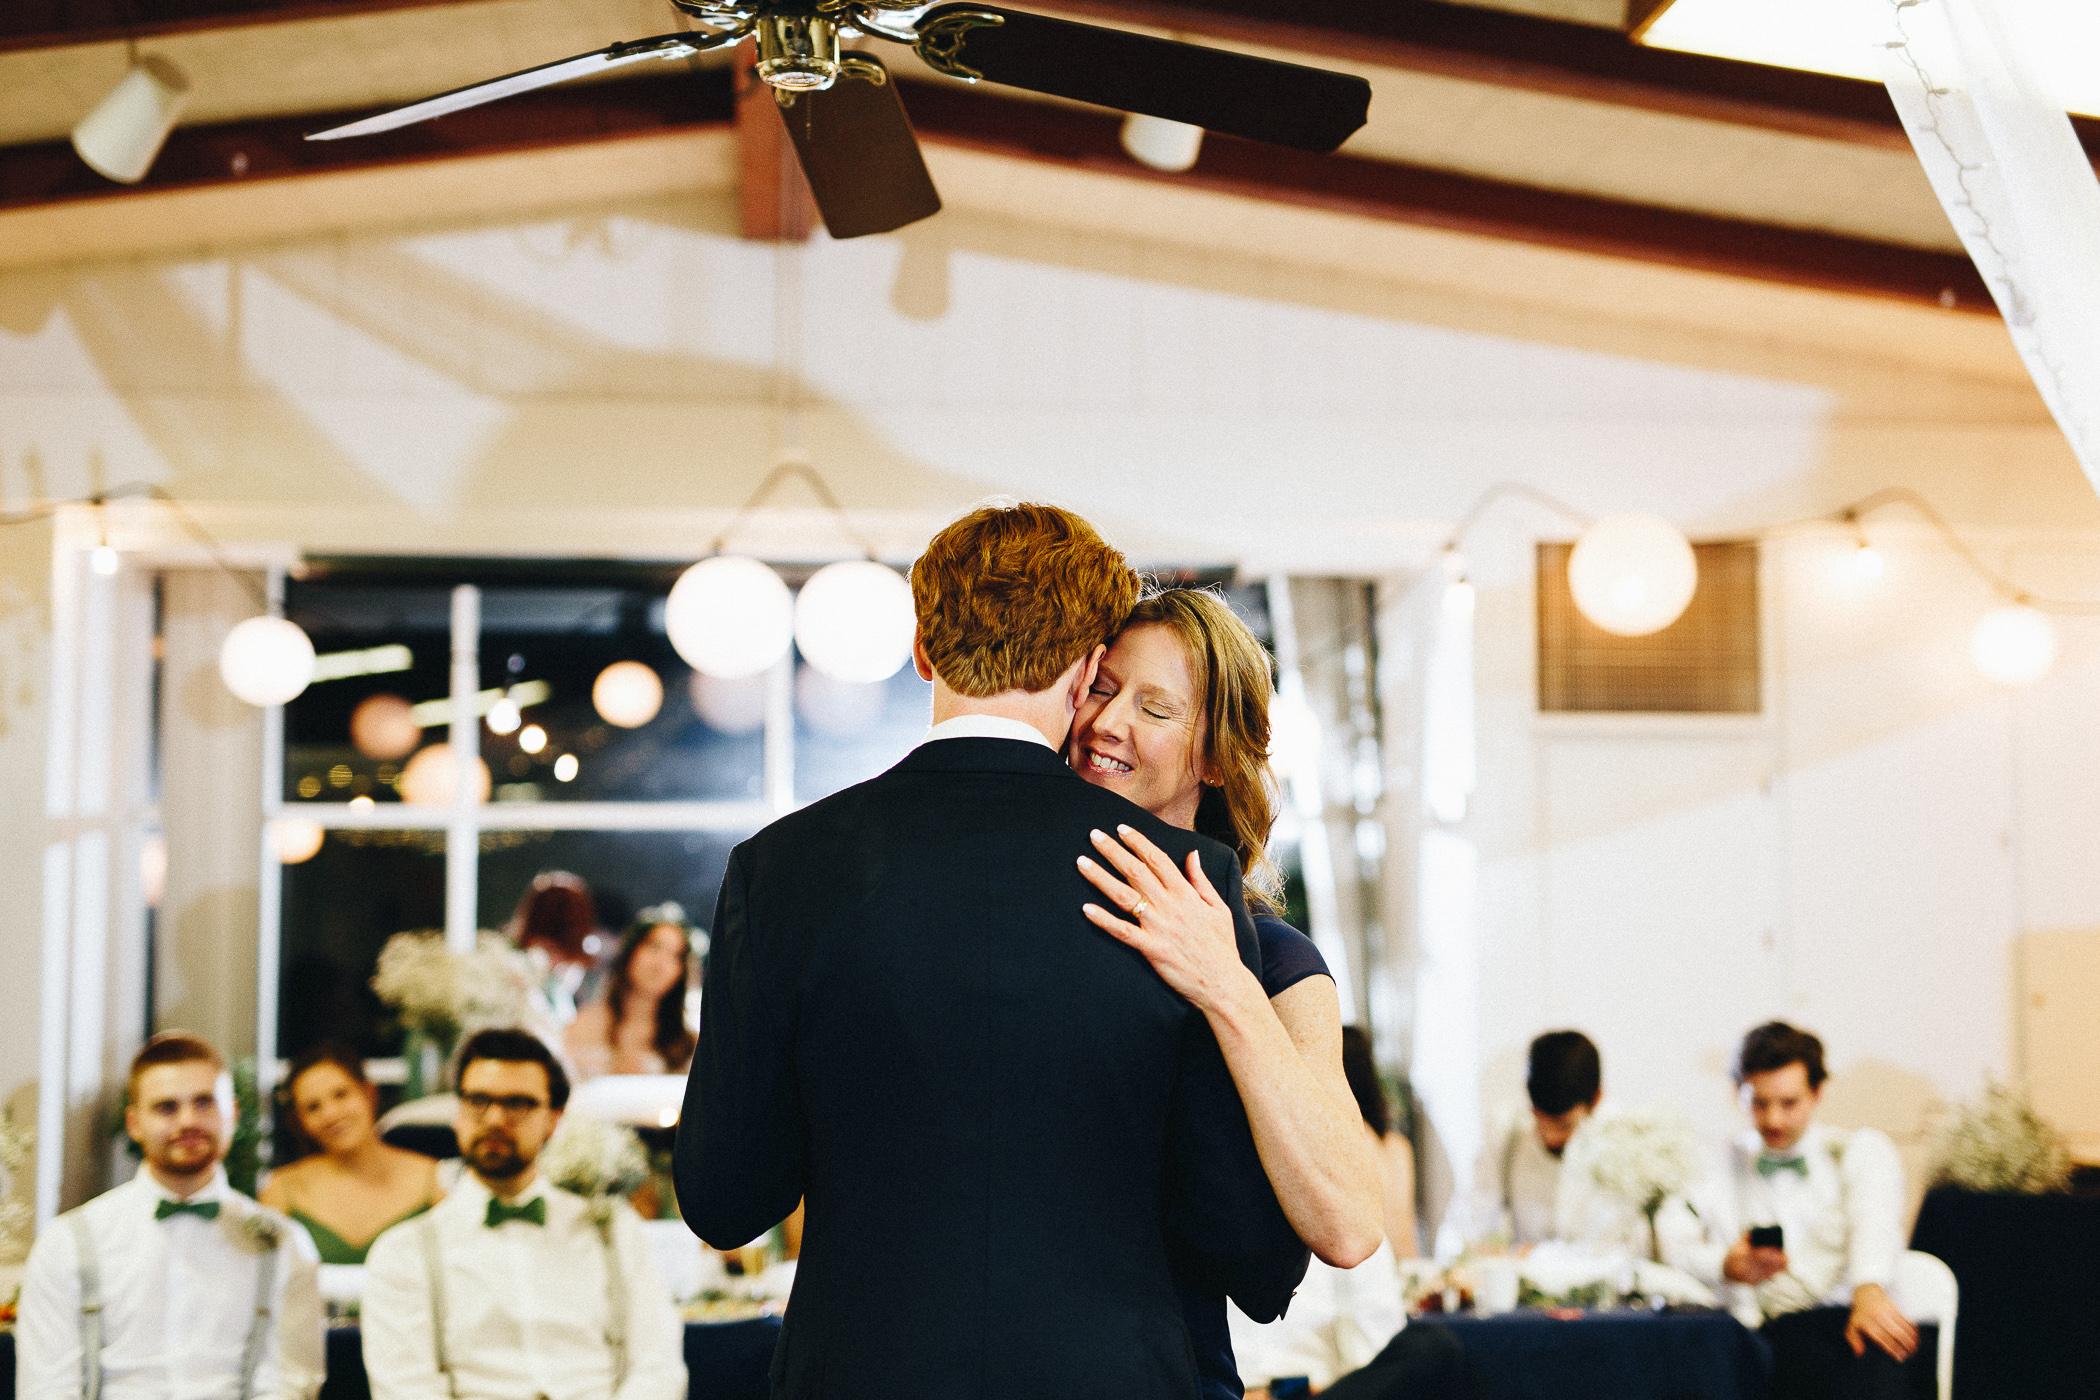 181104-Luxium-Weddings-Arizona-@matt__Le-Brandon-Kariana-Phoenix-Valley-Garden-Center-1134.jpg